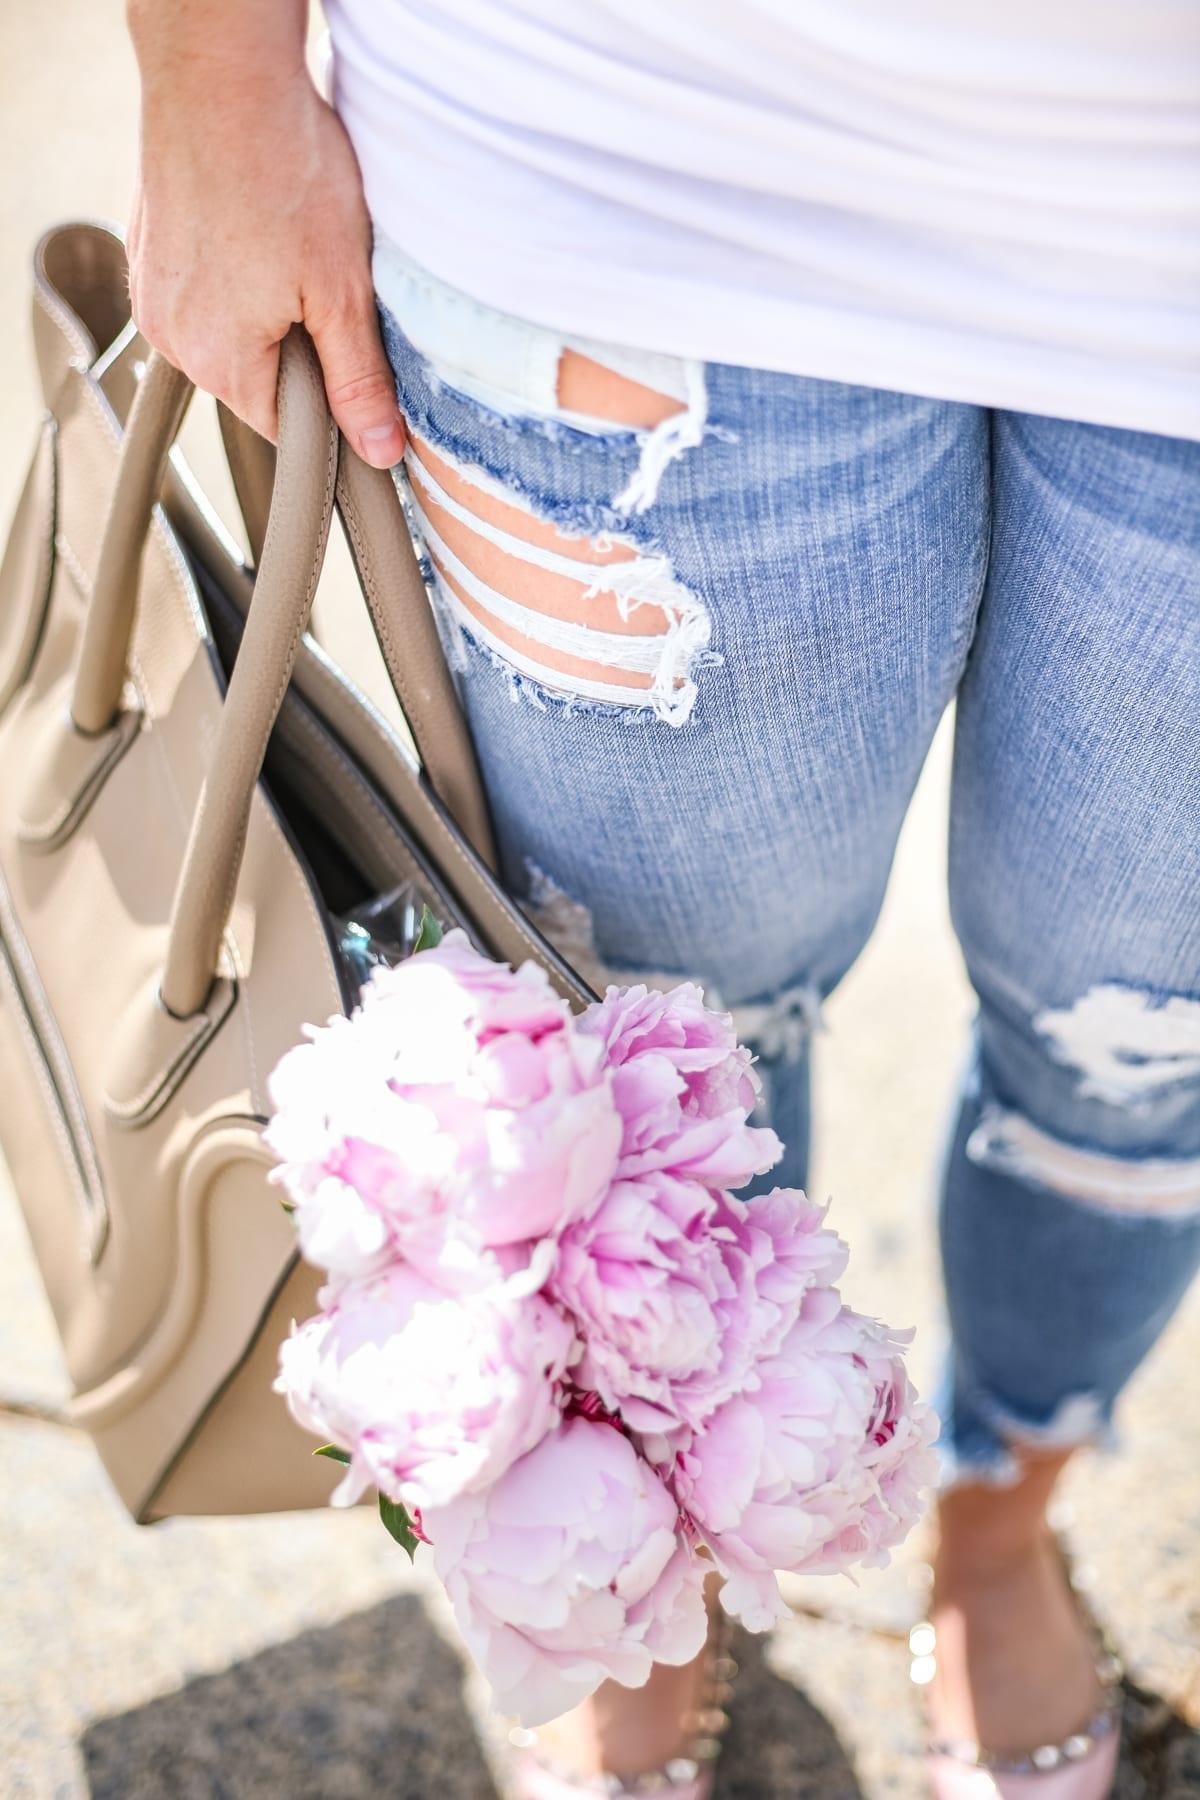 Ashley Pletcher - fashion blogger - Celine bag - ripped jeans - flowers - peonies - white tee shirt